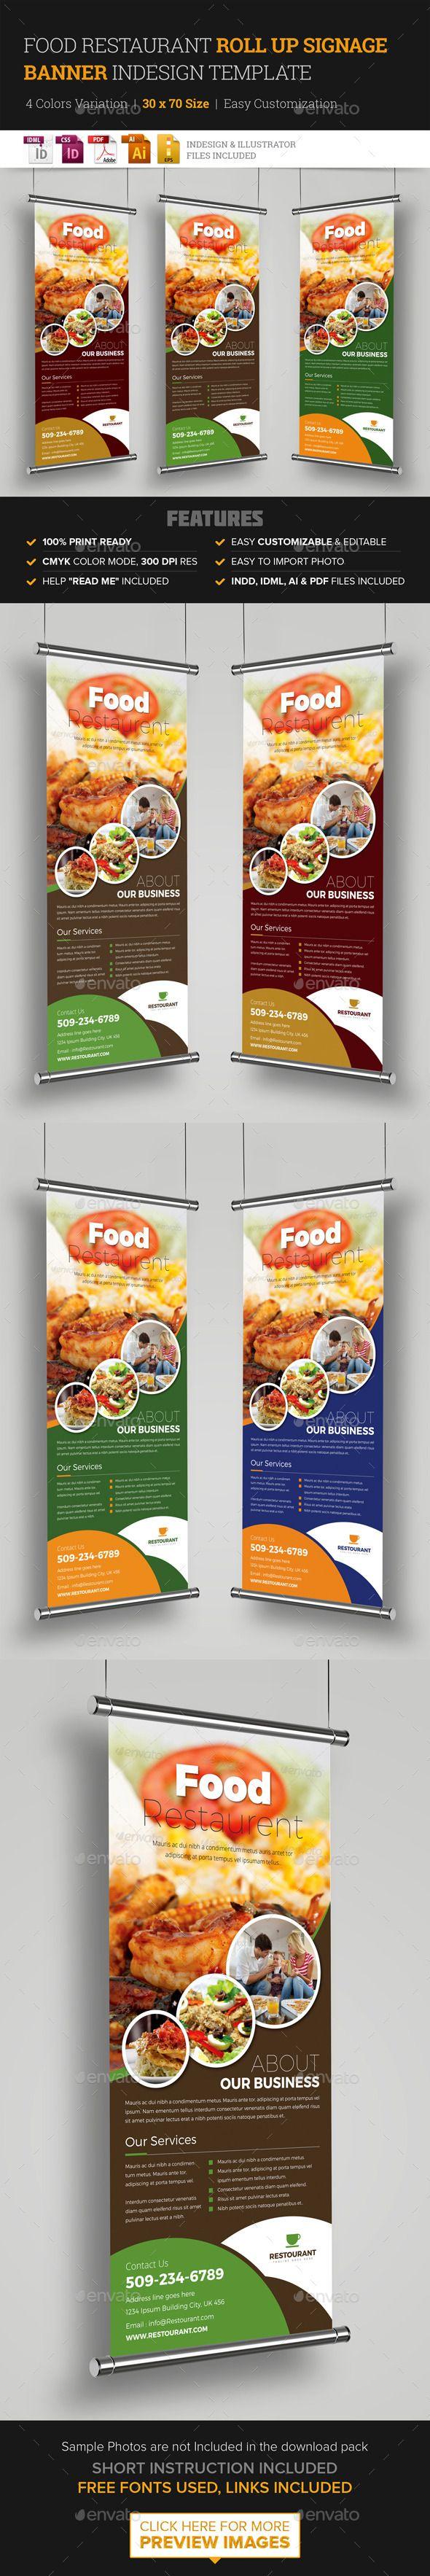 Food Restaurant Roll Up Banner Signage Template #design Download: http://graphicriver.net/item/food-restaurant-roll-up-banner-signage-template/12492675?ref=ksioks